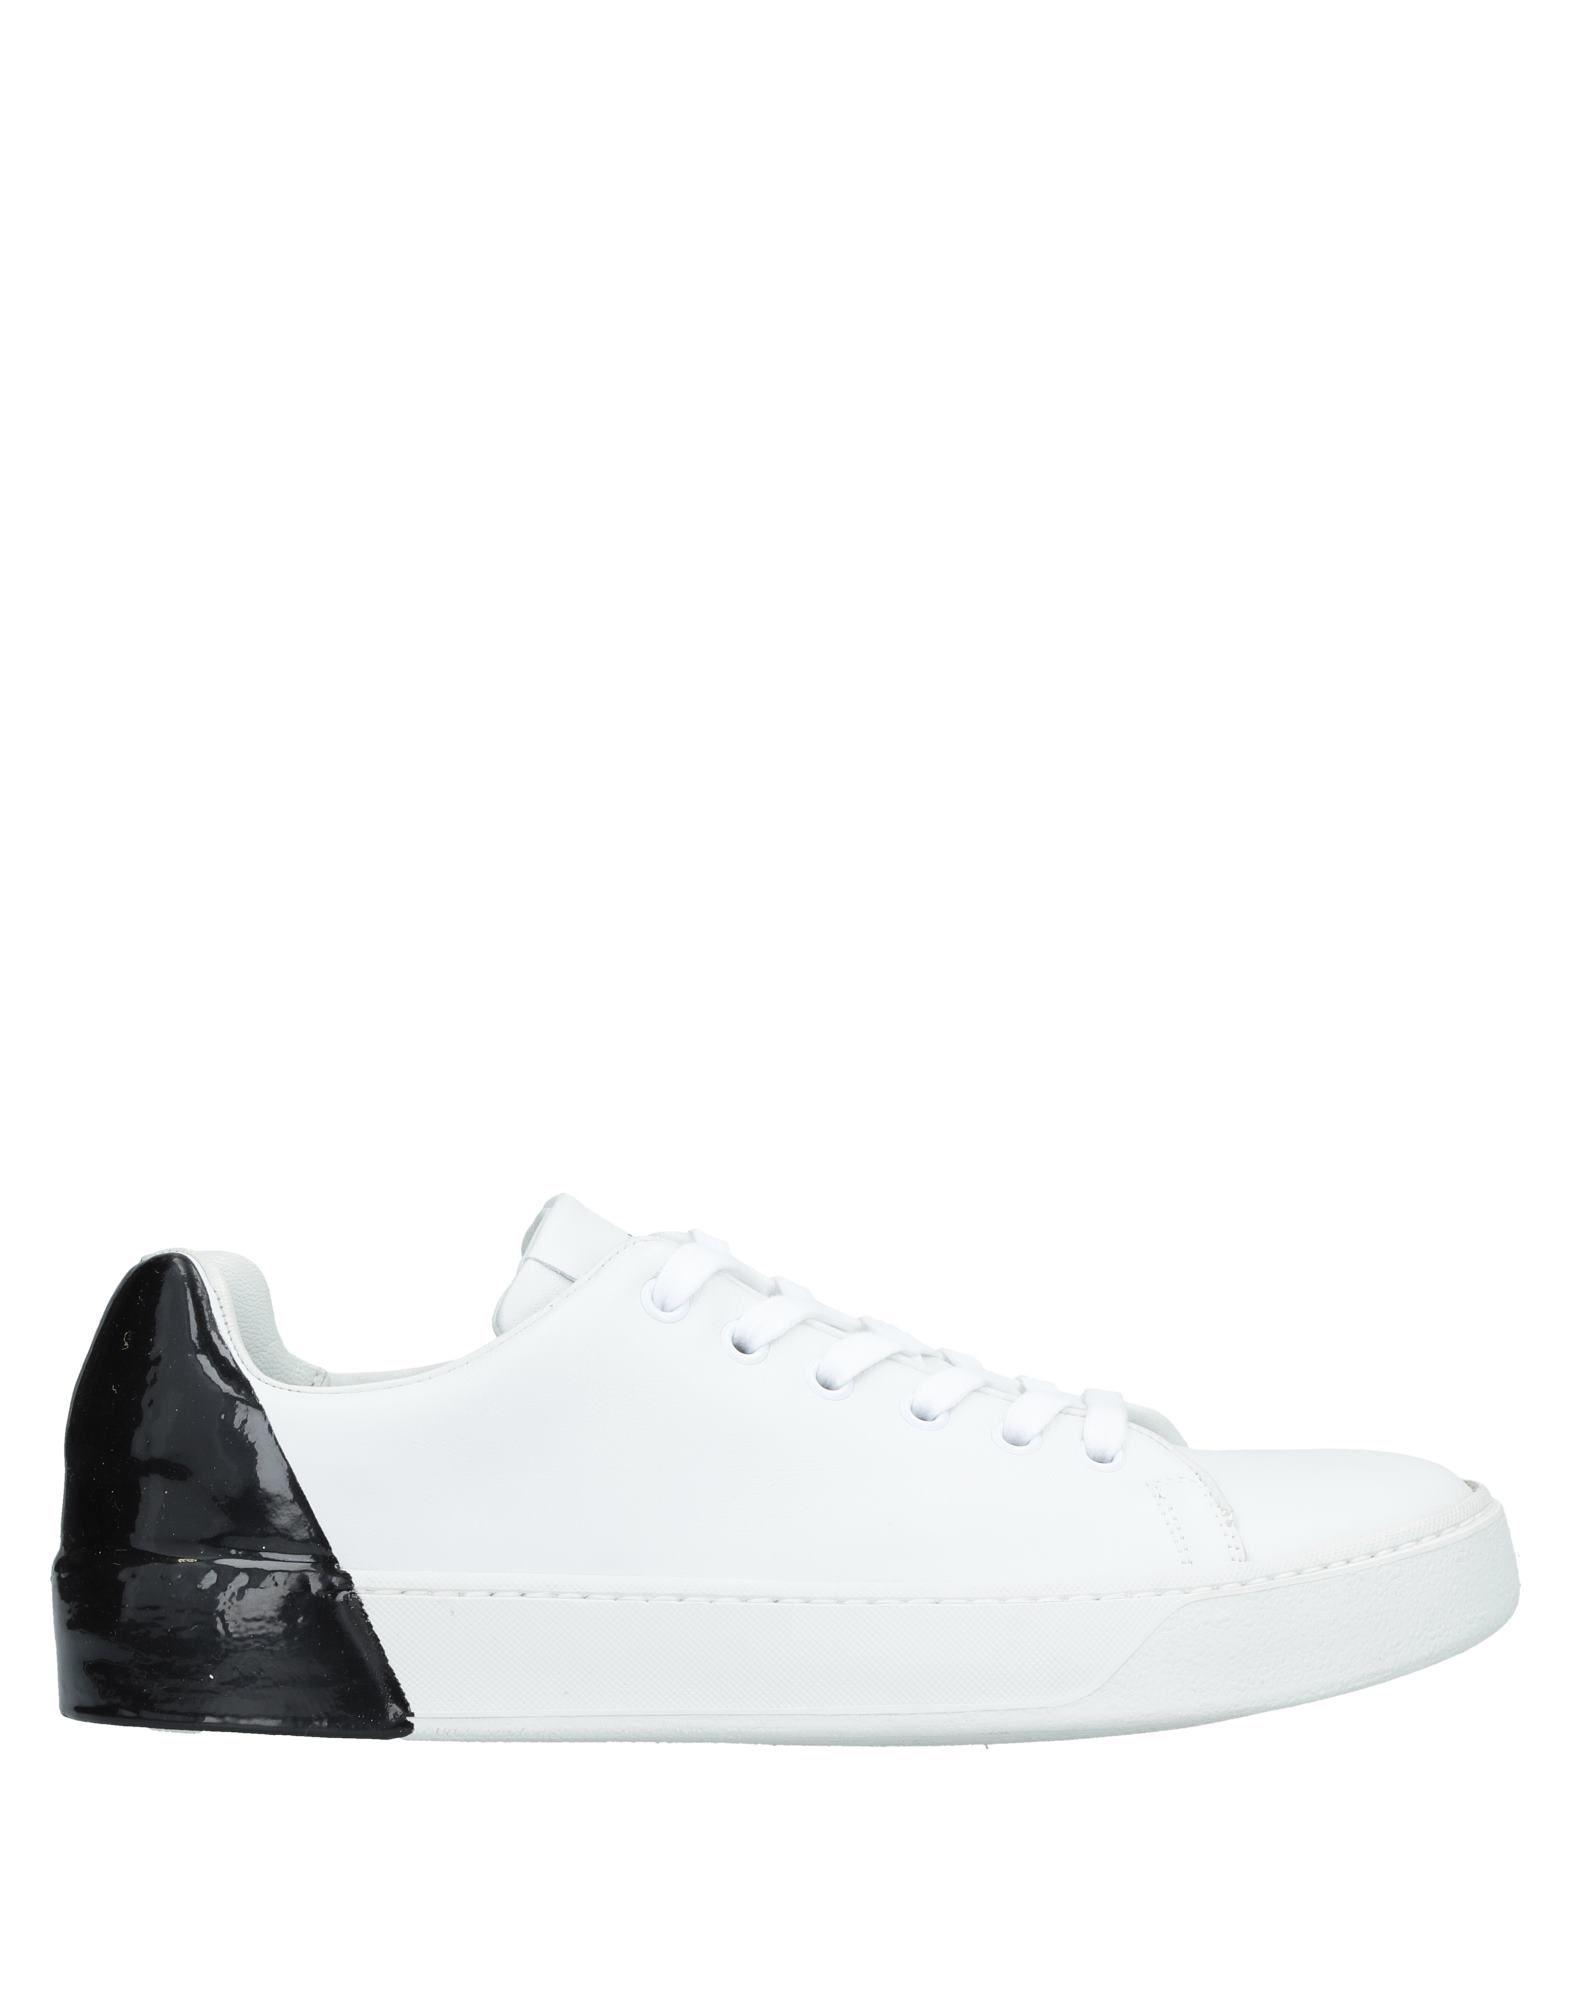 Premiata Sneakers Herren  11535918TU Gute Qualität beliebte Schuhe